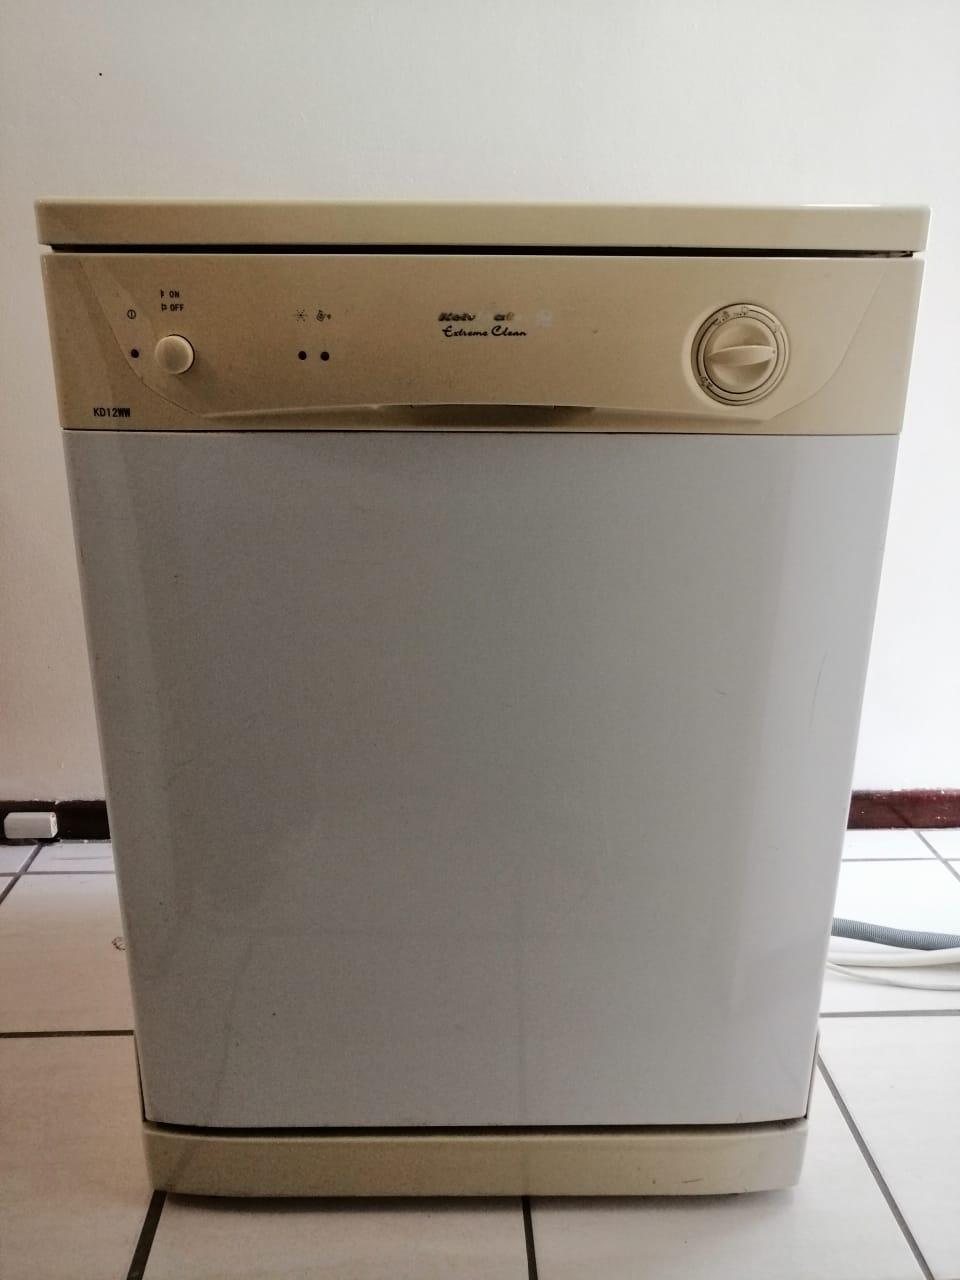 Kelvinator KD12WW Dishwasher for sale